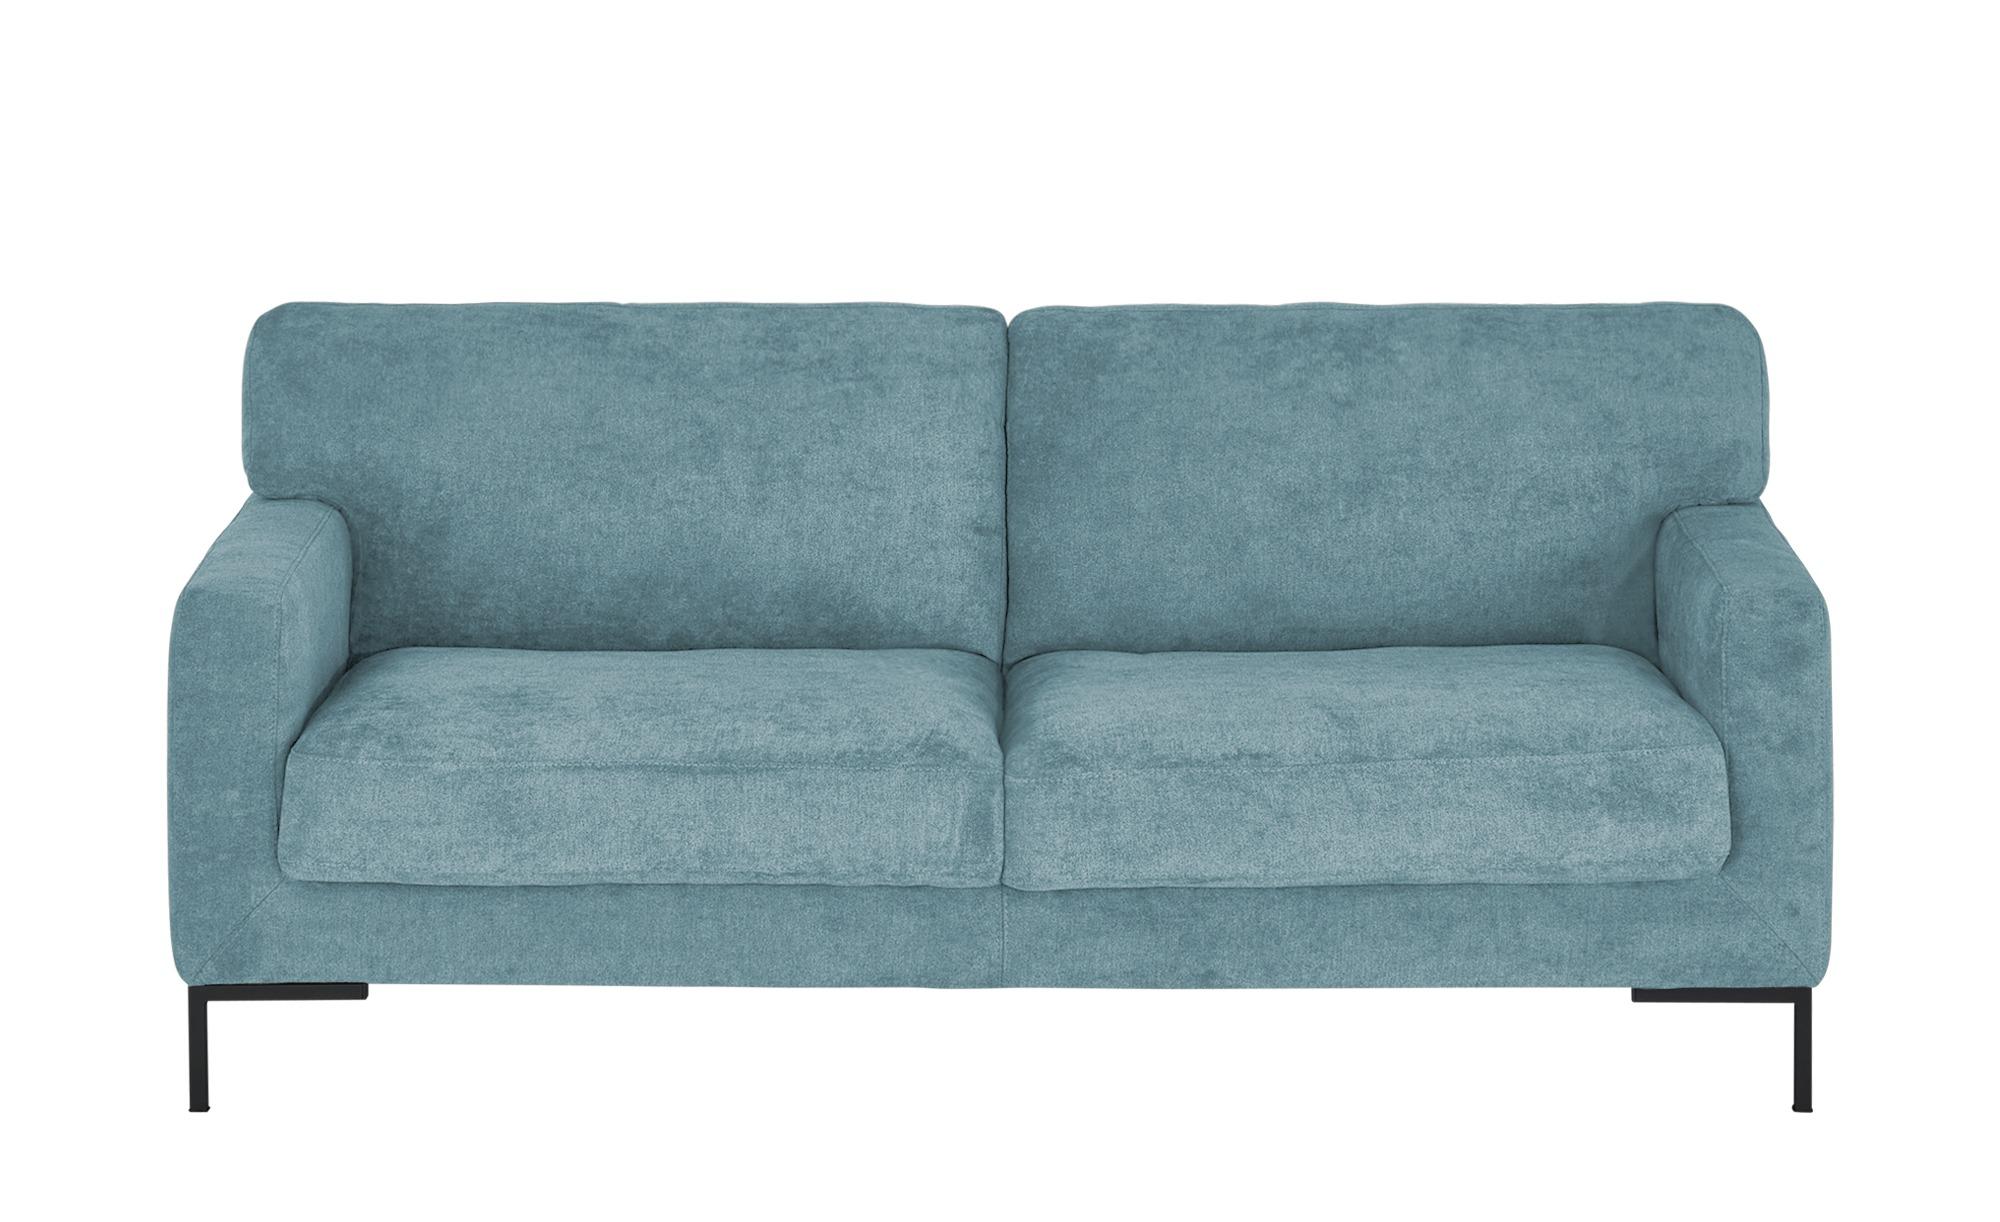 smart Sofa  Tine ¦ blau ¦ Maße (cm): B: 190 H: 82 T: 95 Polstermöbel > Sofas > 3-Sitzer - Höffner